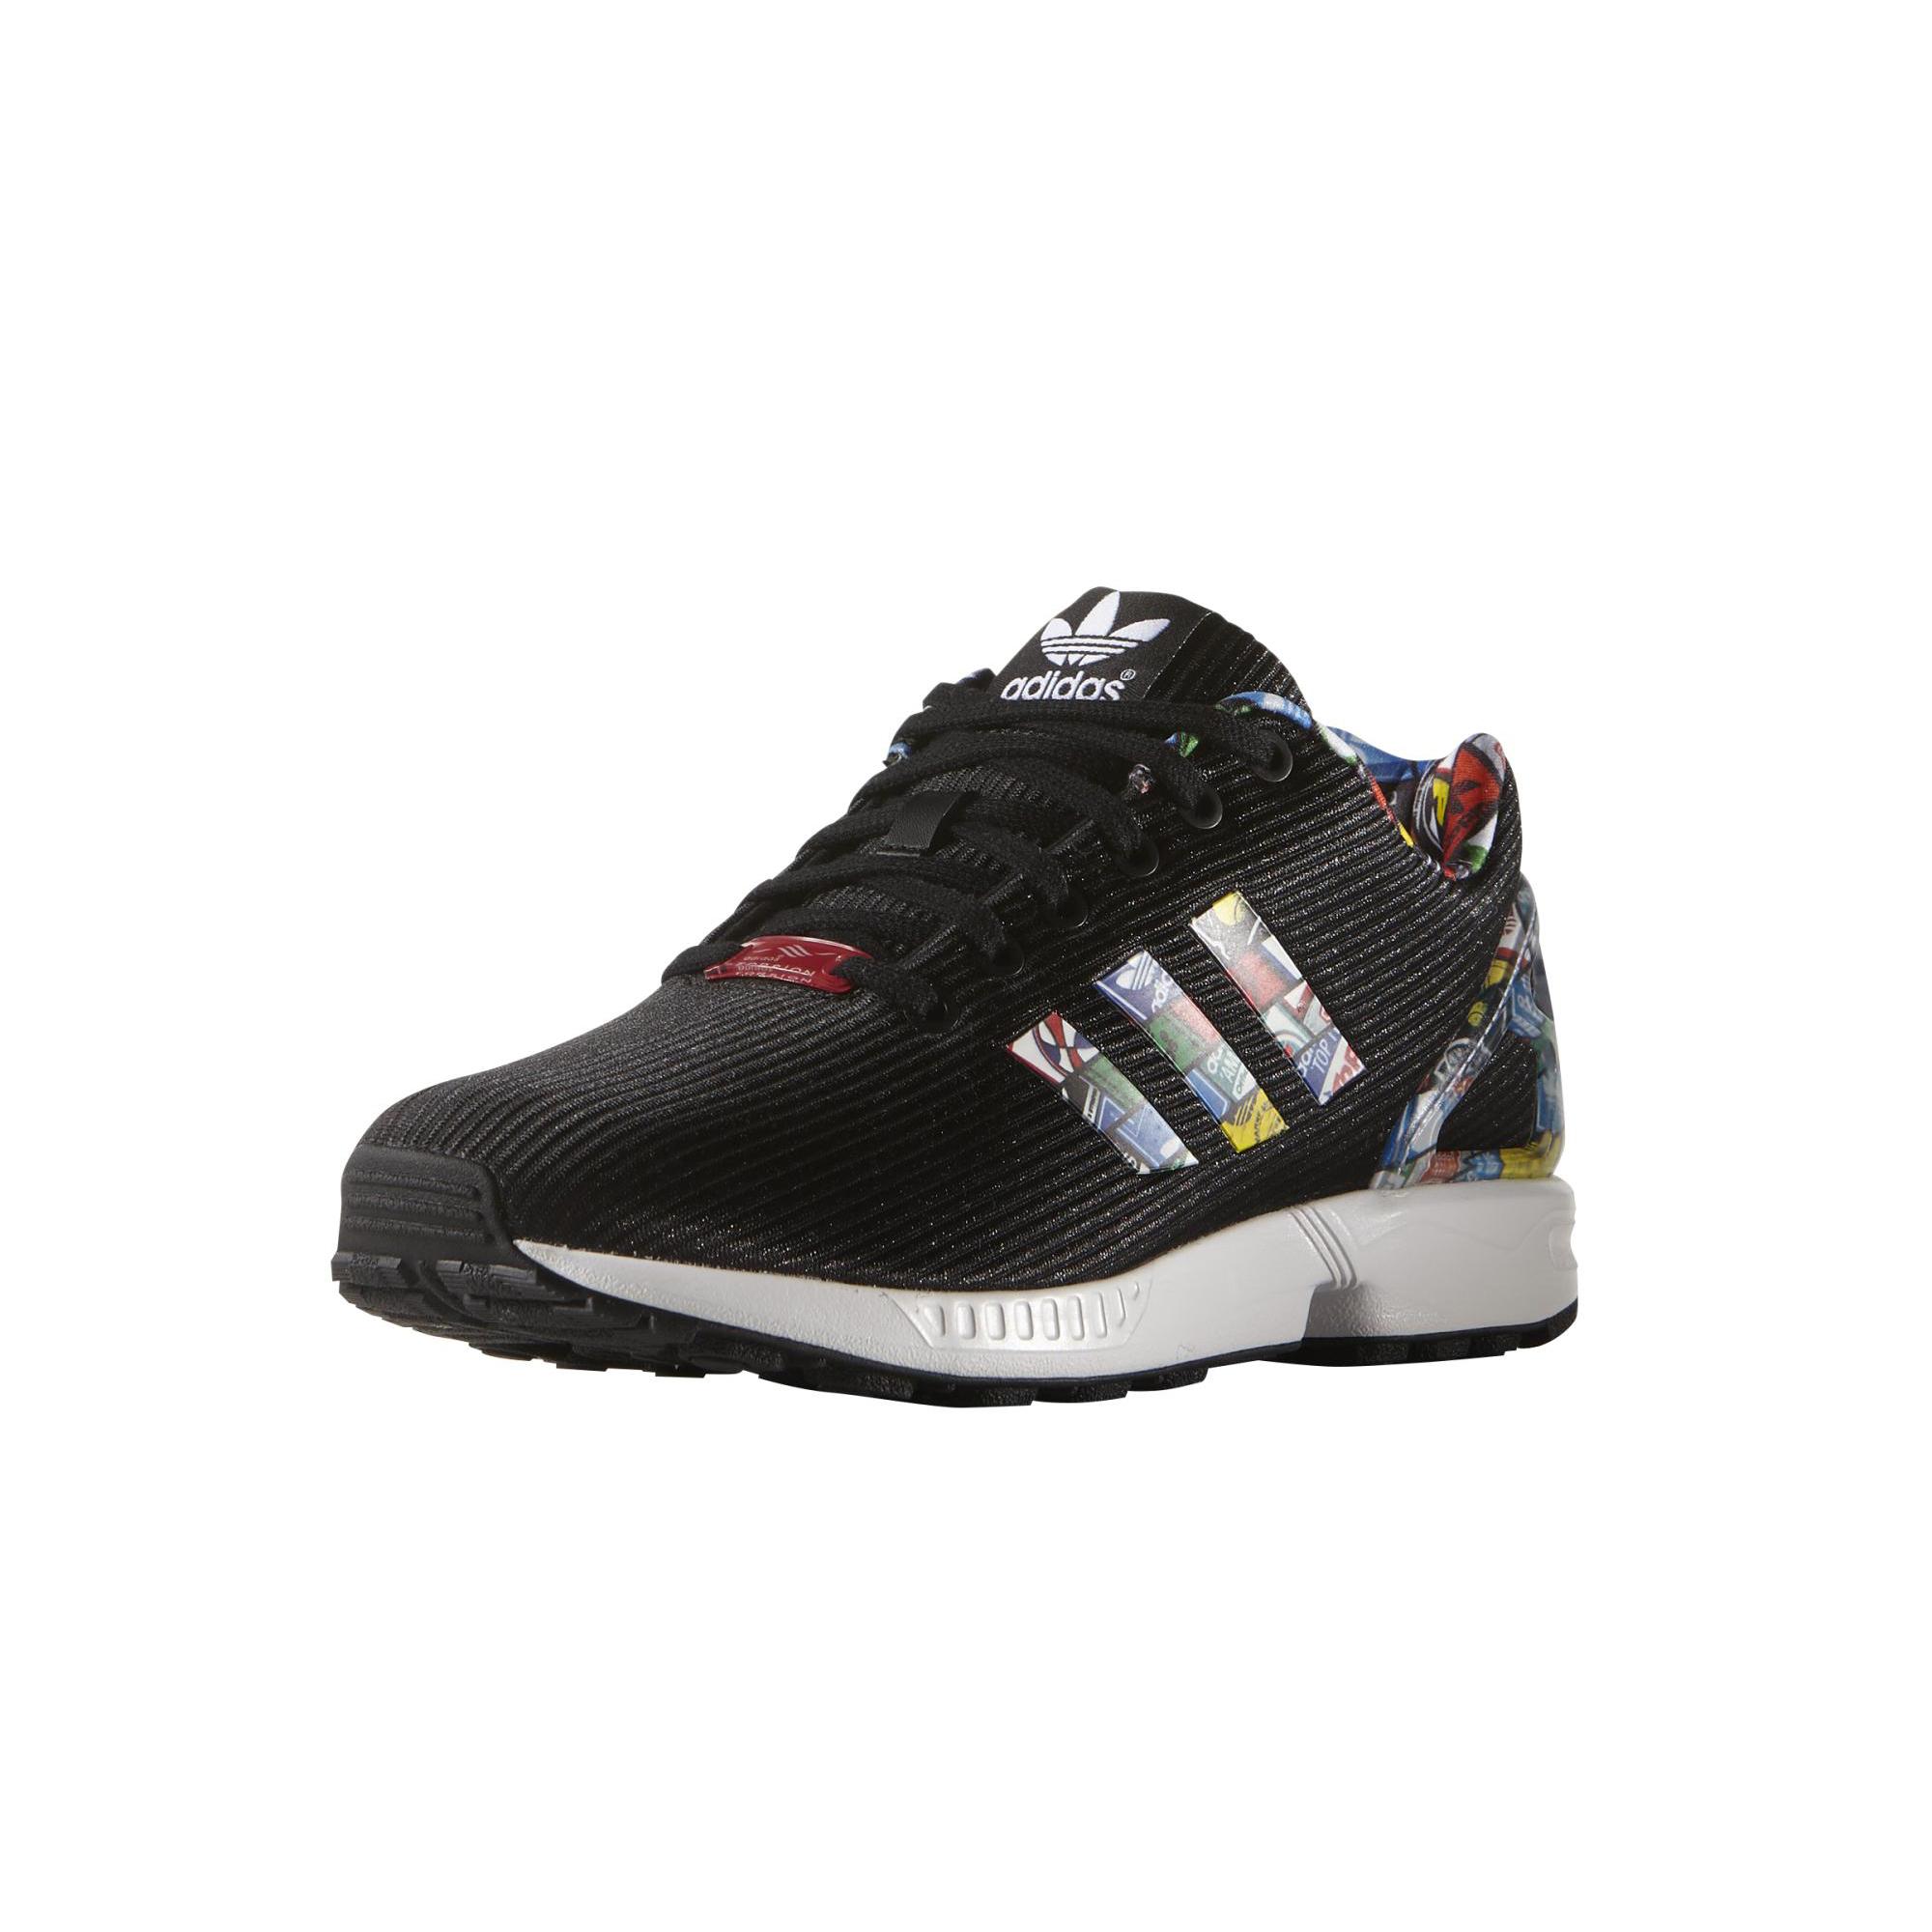 the best attitude cad52 7c0ef ... sale adidas originals zx flux black tongue negro multicolor 13b8c a93e6